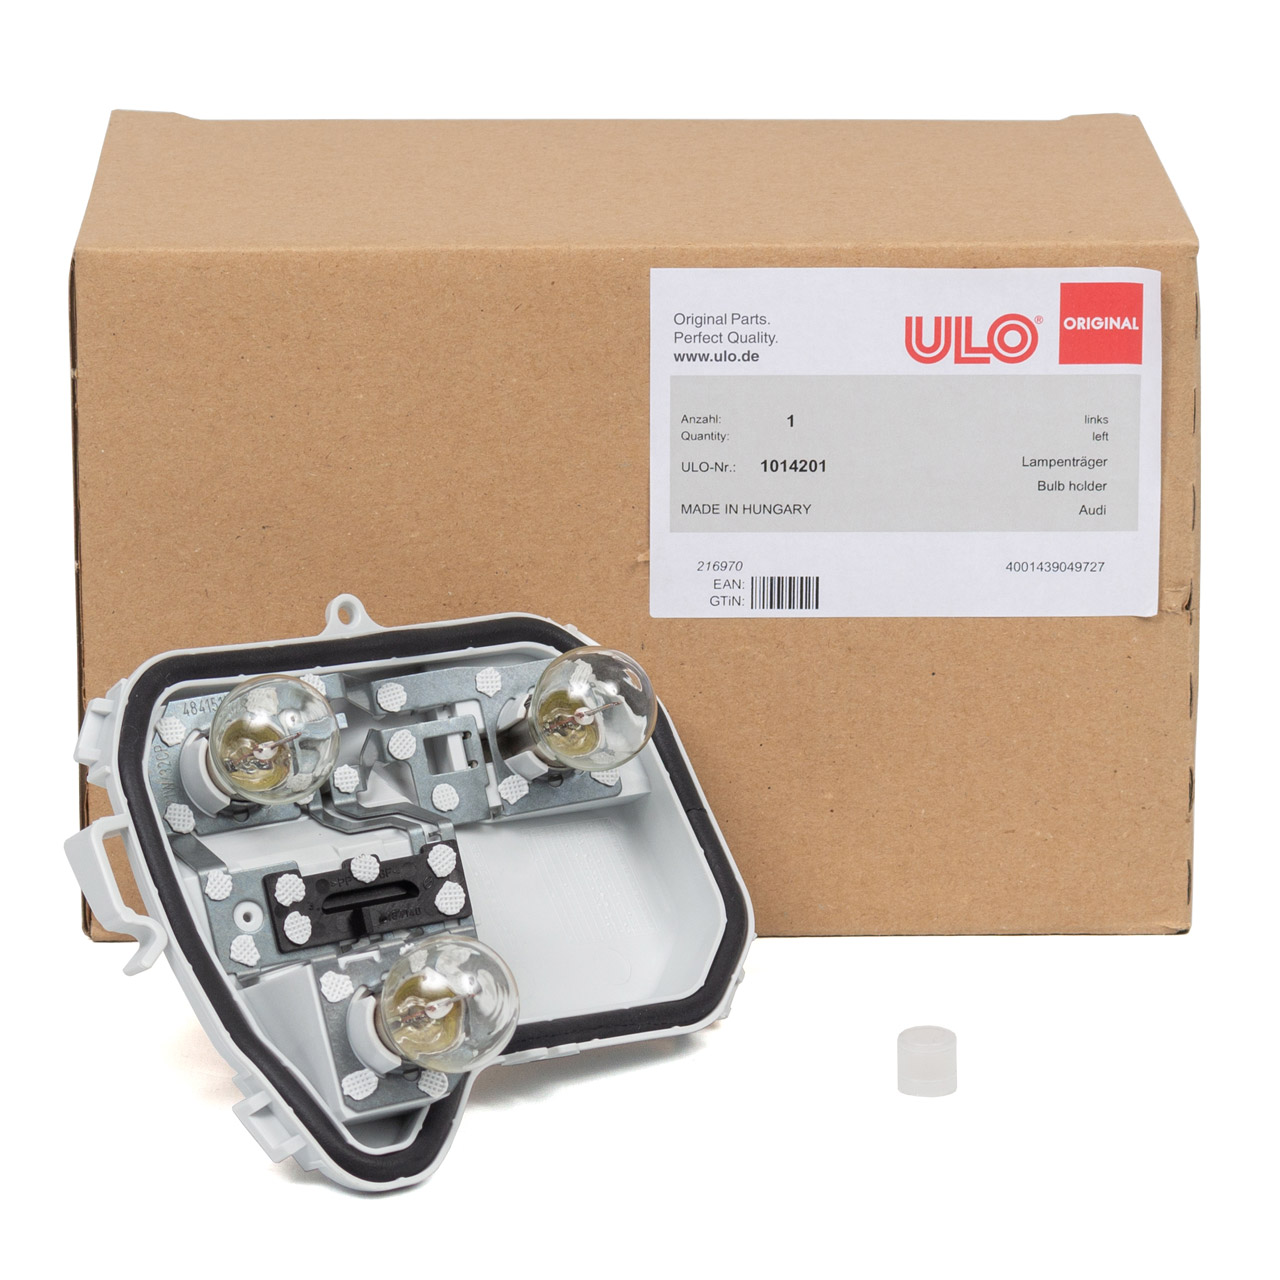 ULO Lampenträger Heckleuchte + Glühlampen AUDI A4 Avant (B7 8E) links außen 8E9945257B